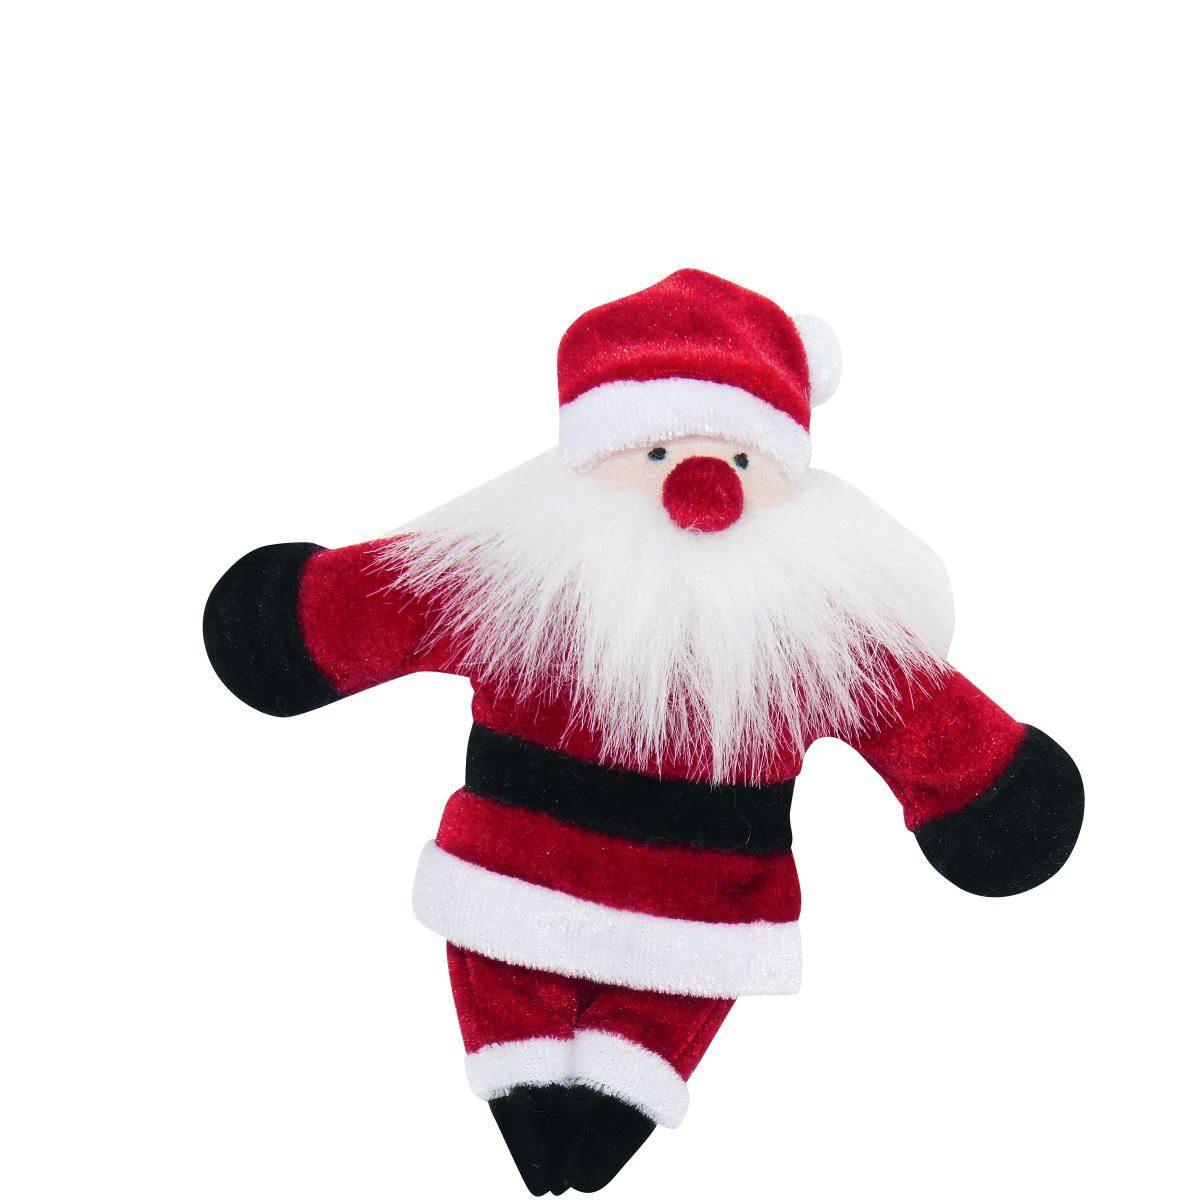 BUTLERS FREECLIMBER »Magnetfigur Santa«